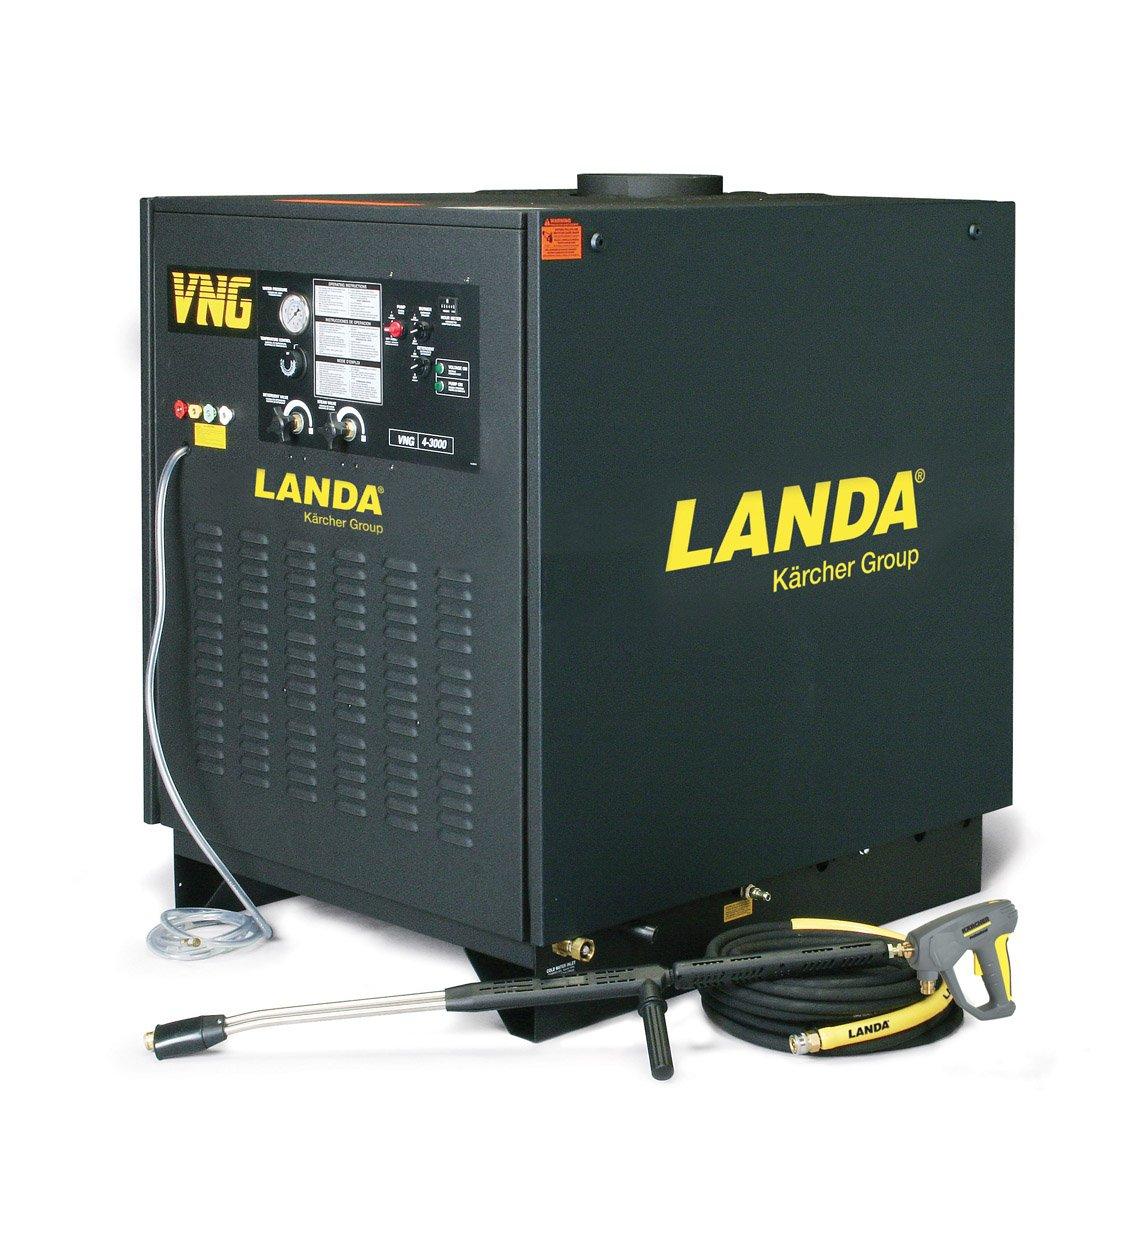 Landa Vng4 30024a Stationary Hot Water Electric